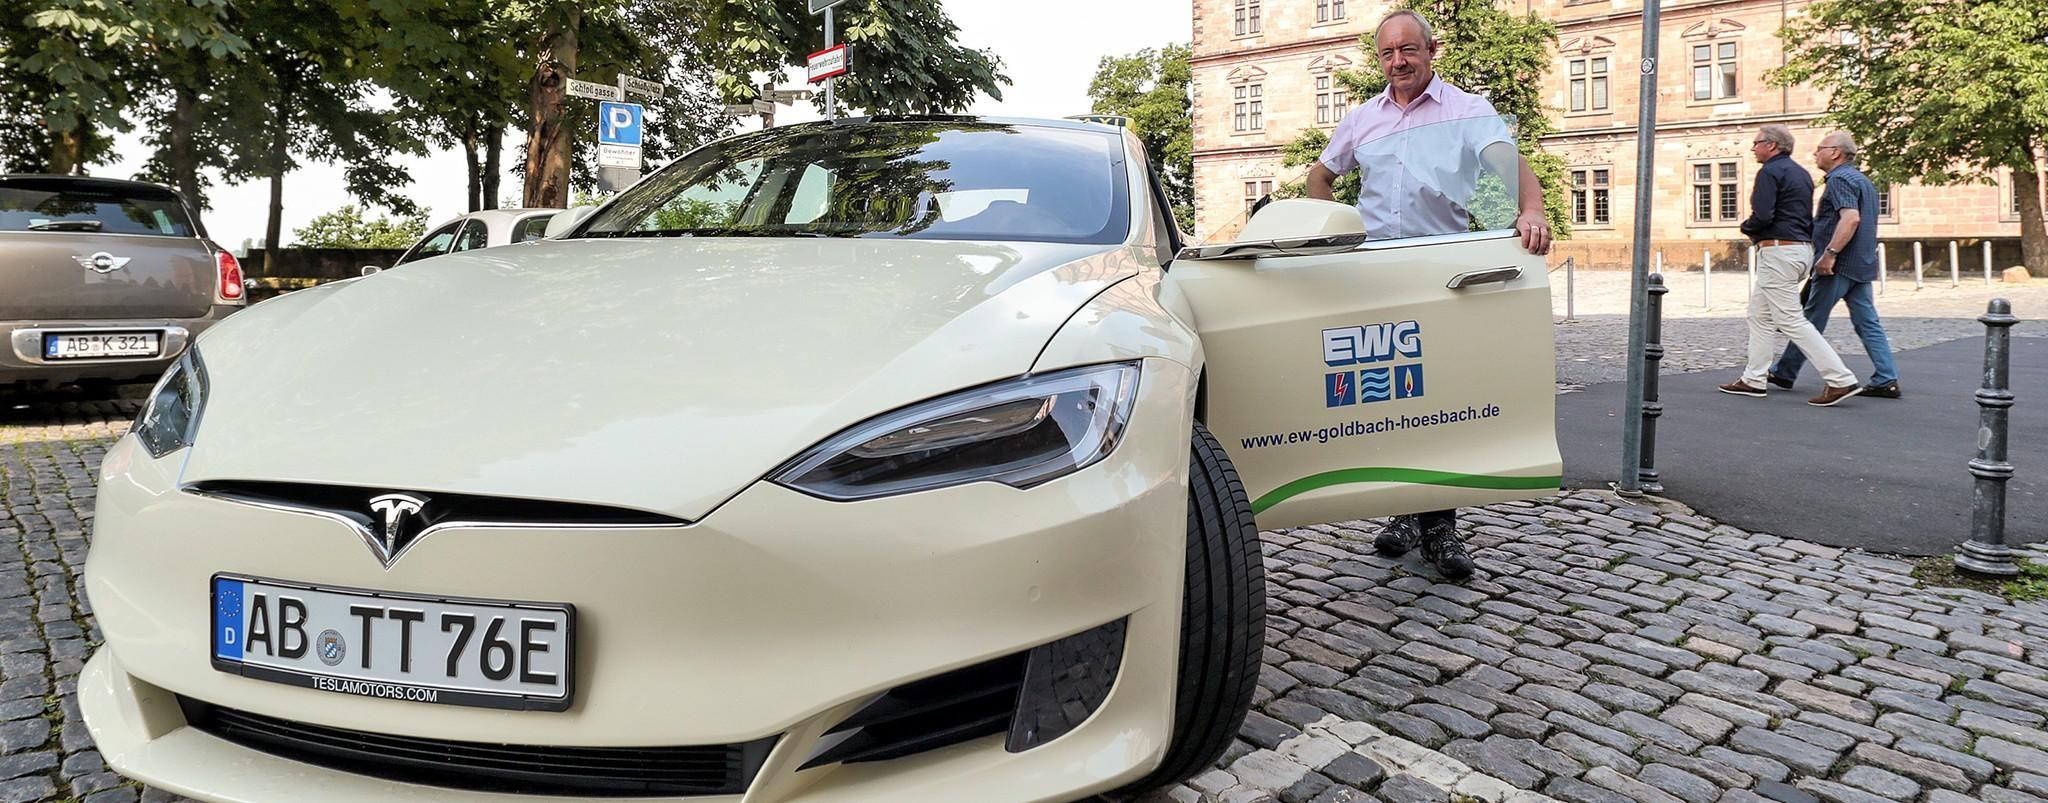 Erstes Tesla Taxi Rollt Durch Aschaffenburg Tesla Aschaffenburg Mitfahren